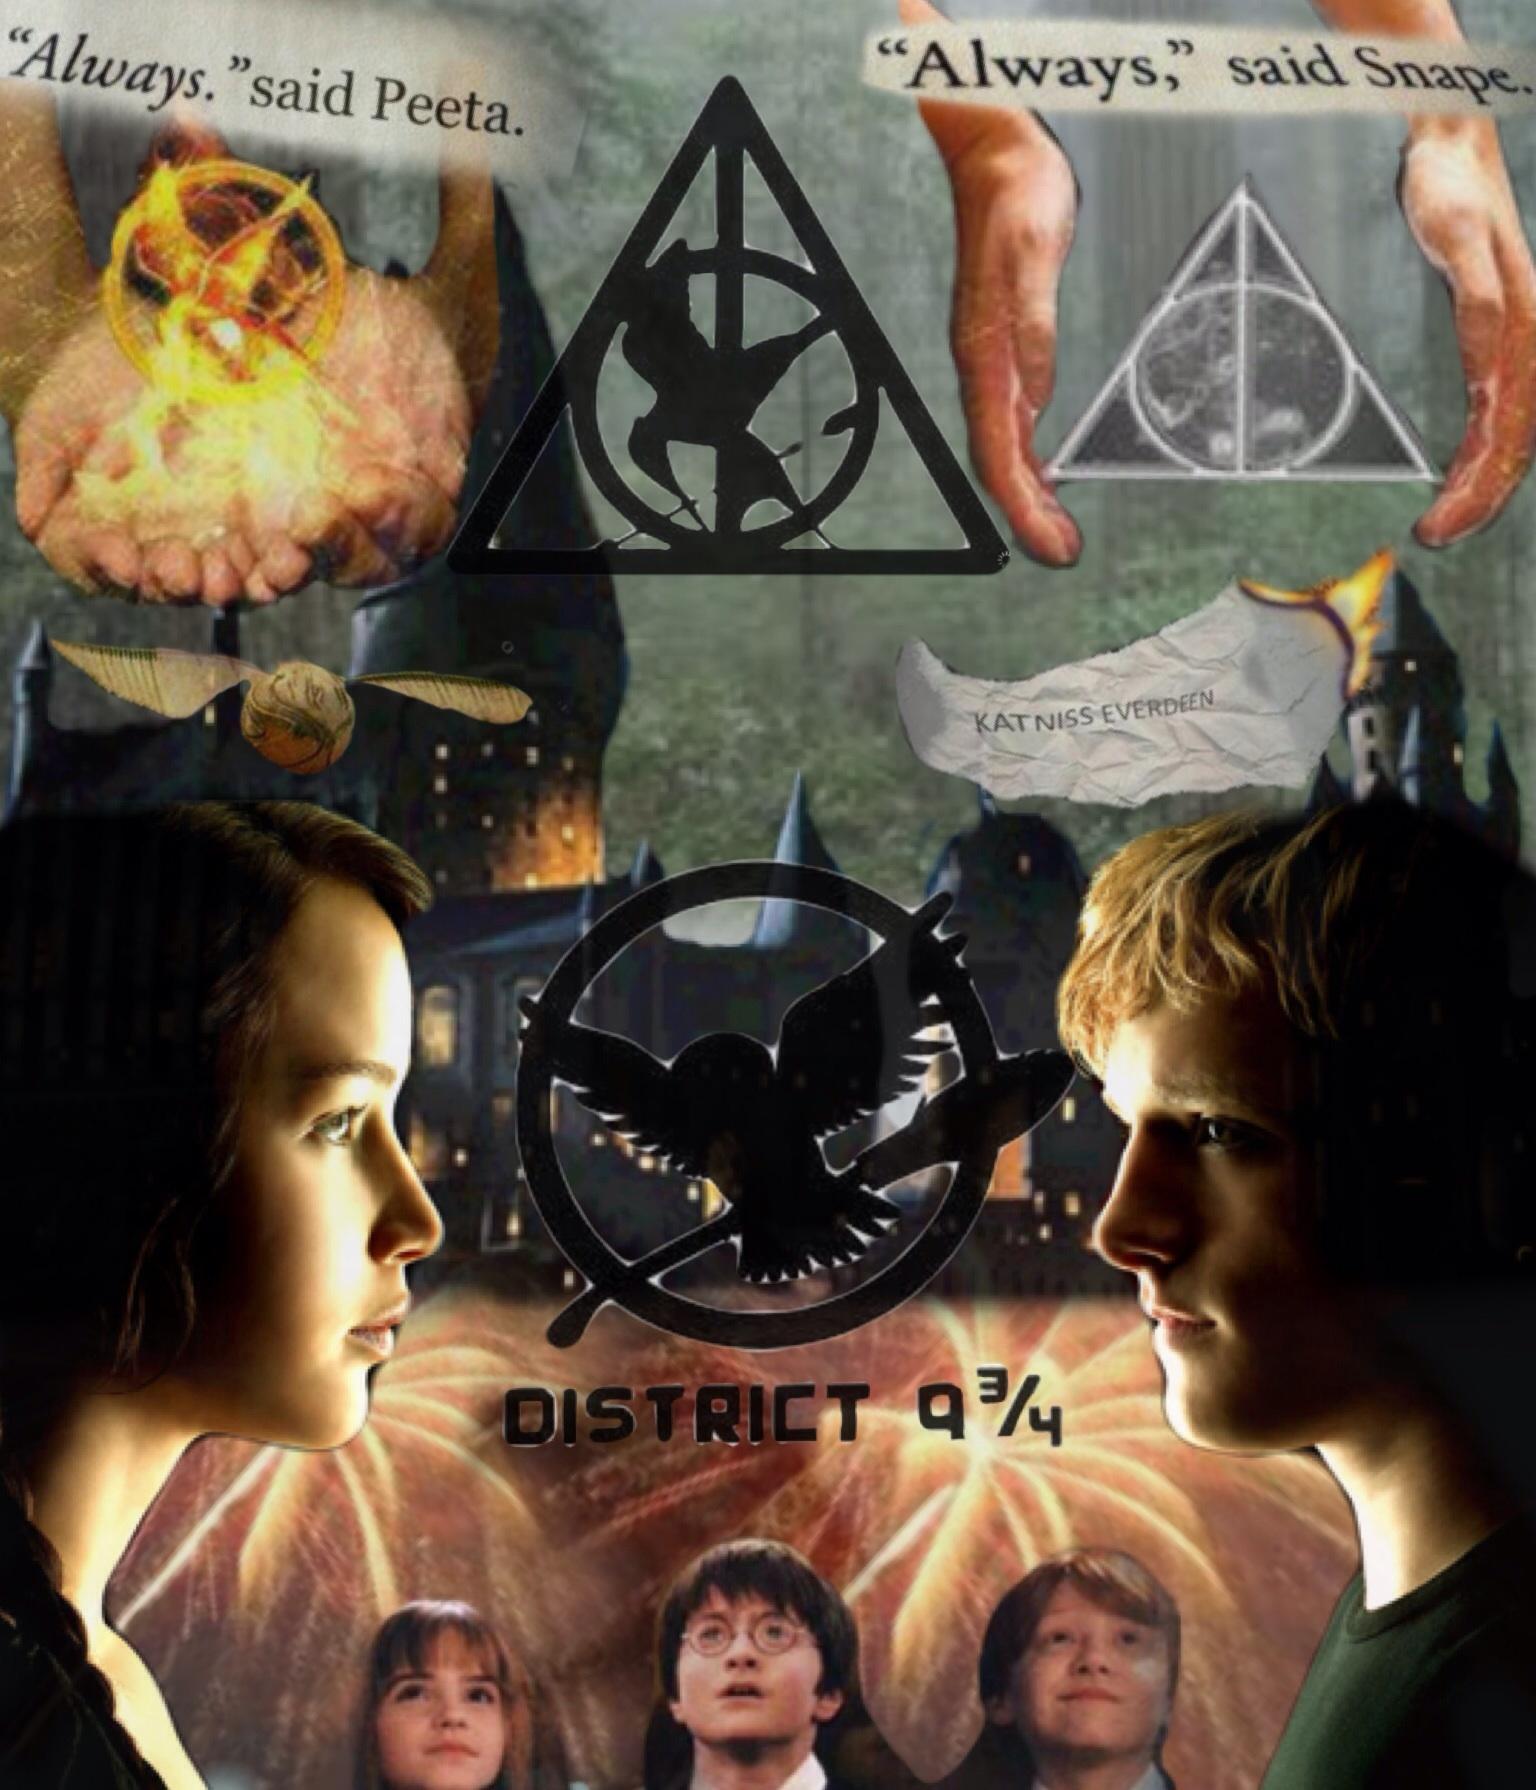 District 9 3/4 (Harry Potter/Hunger Games)